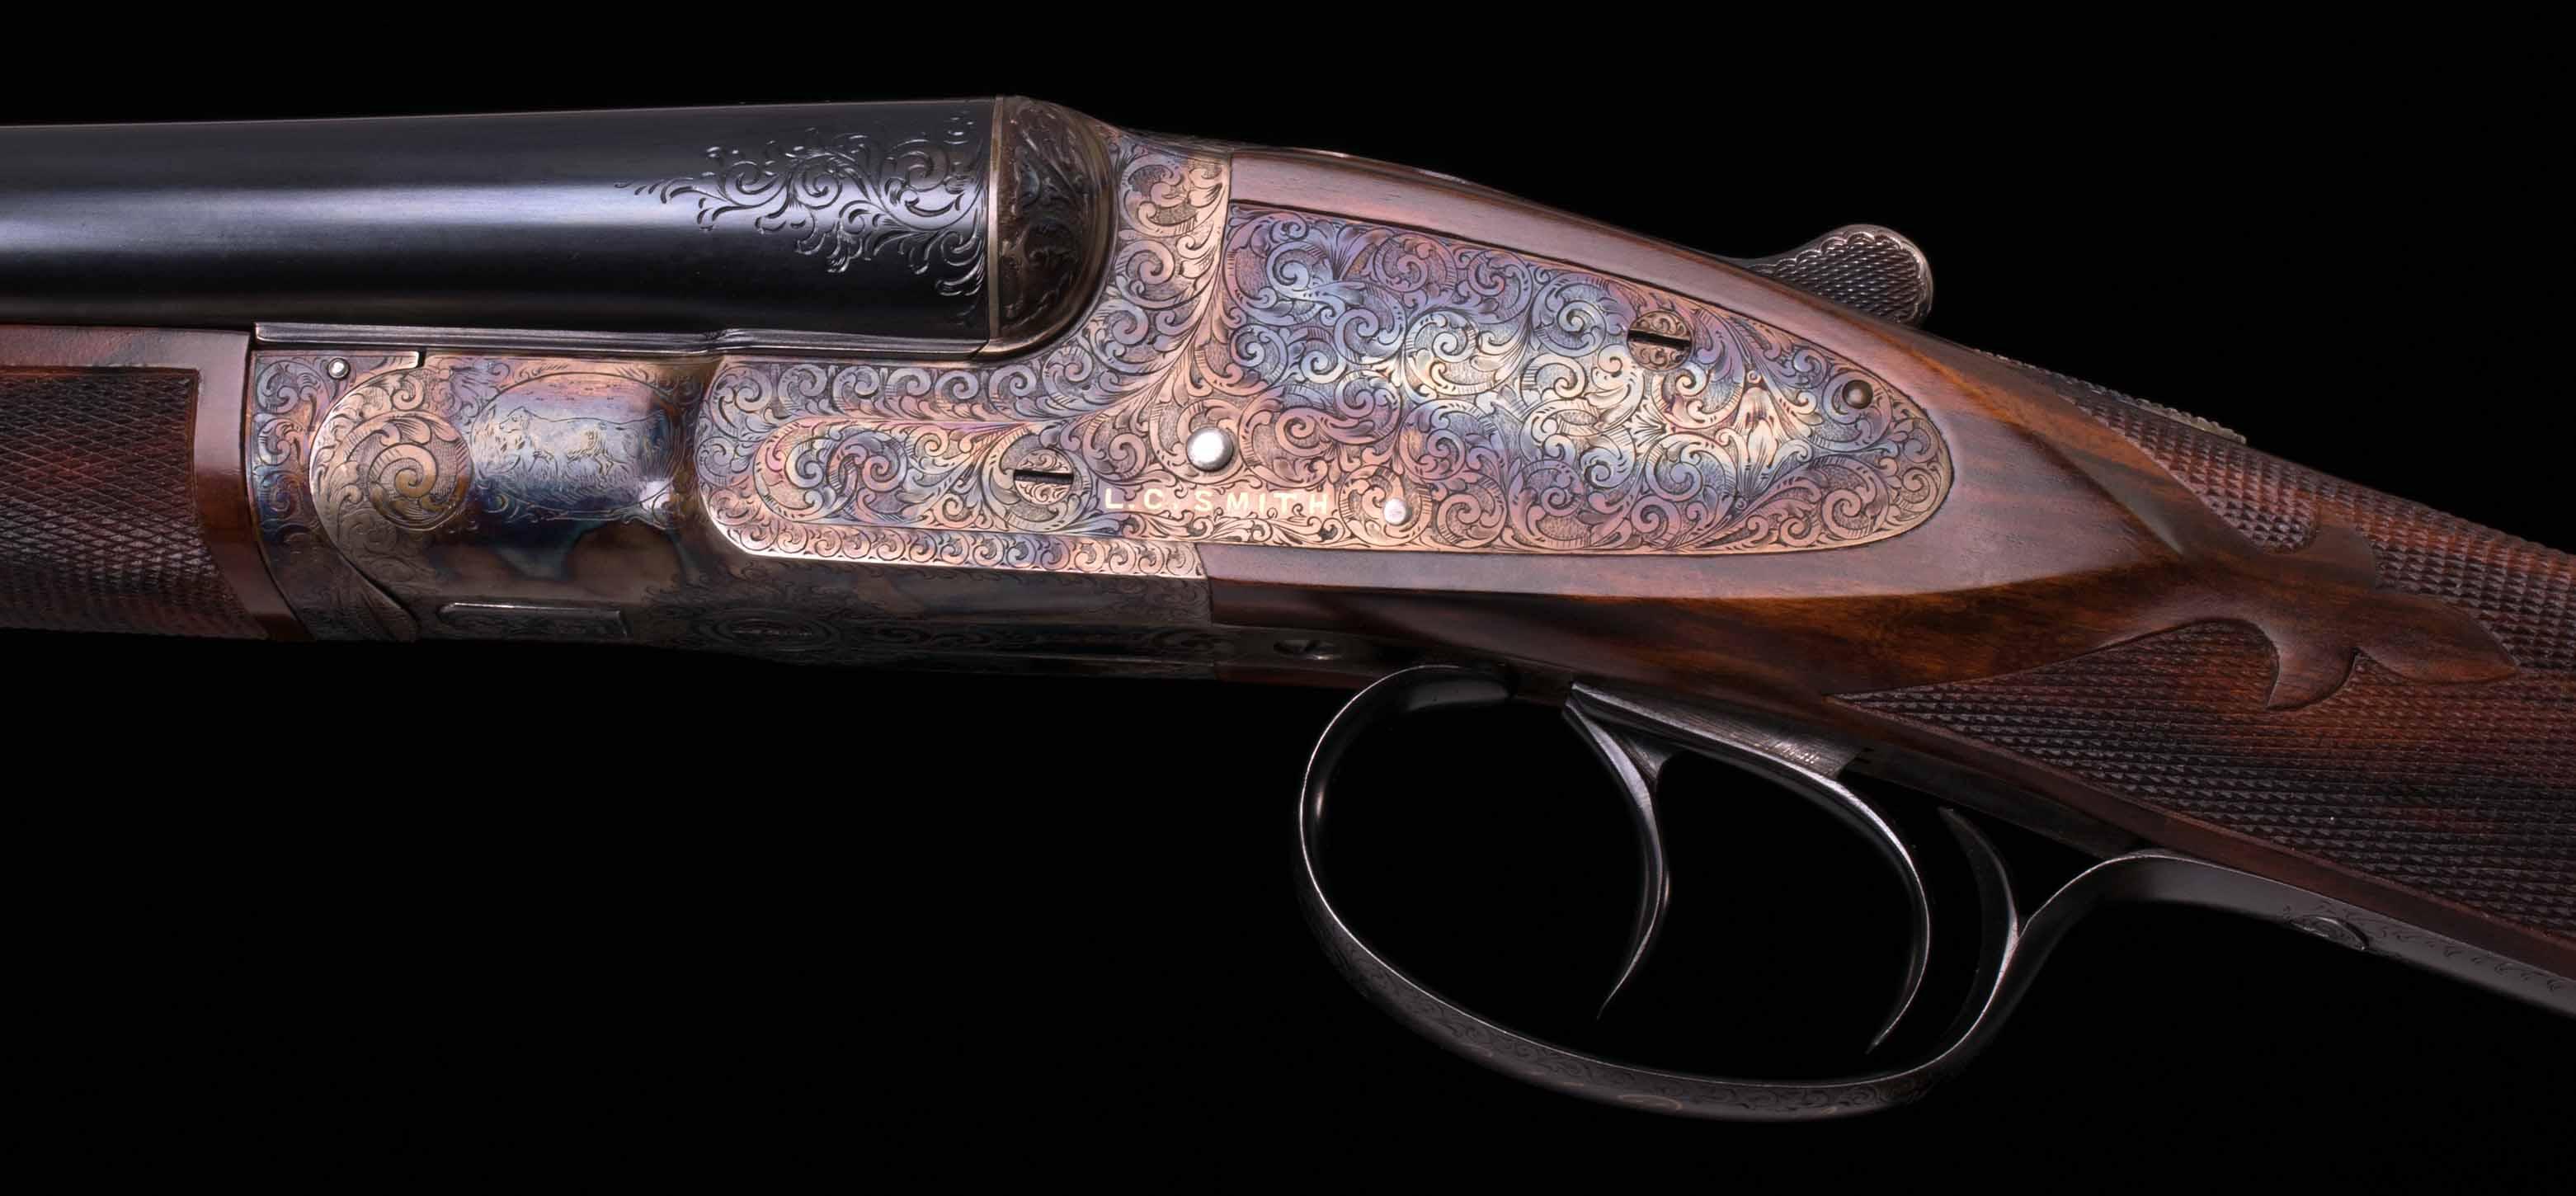 L C  Smith A-2 20 Gauge Shotgun | LC Smith Shotguns For Sale